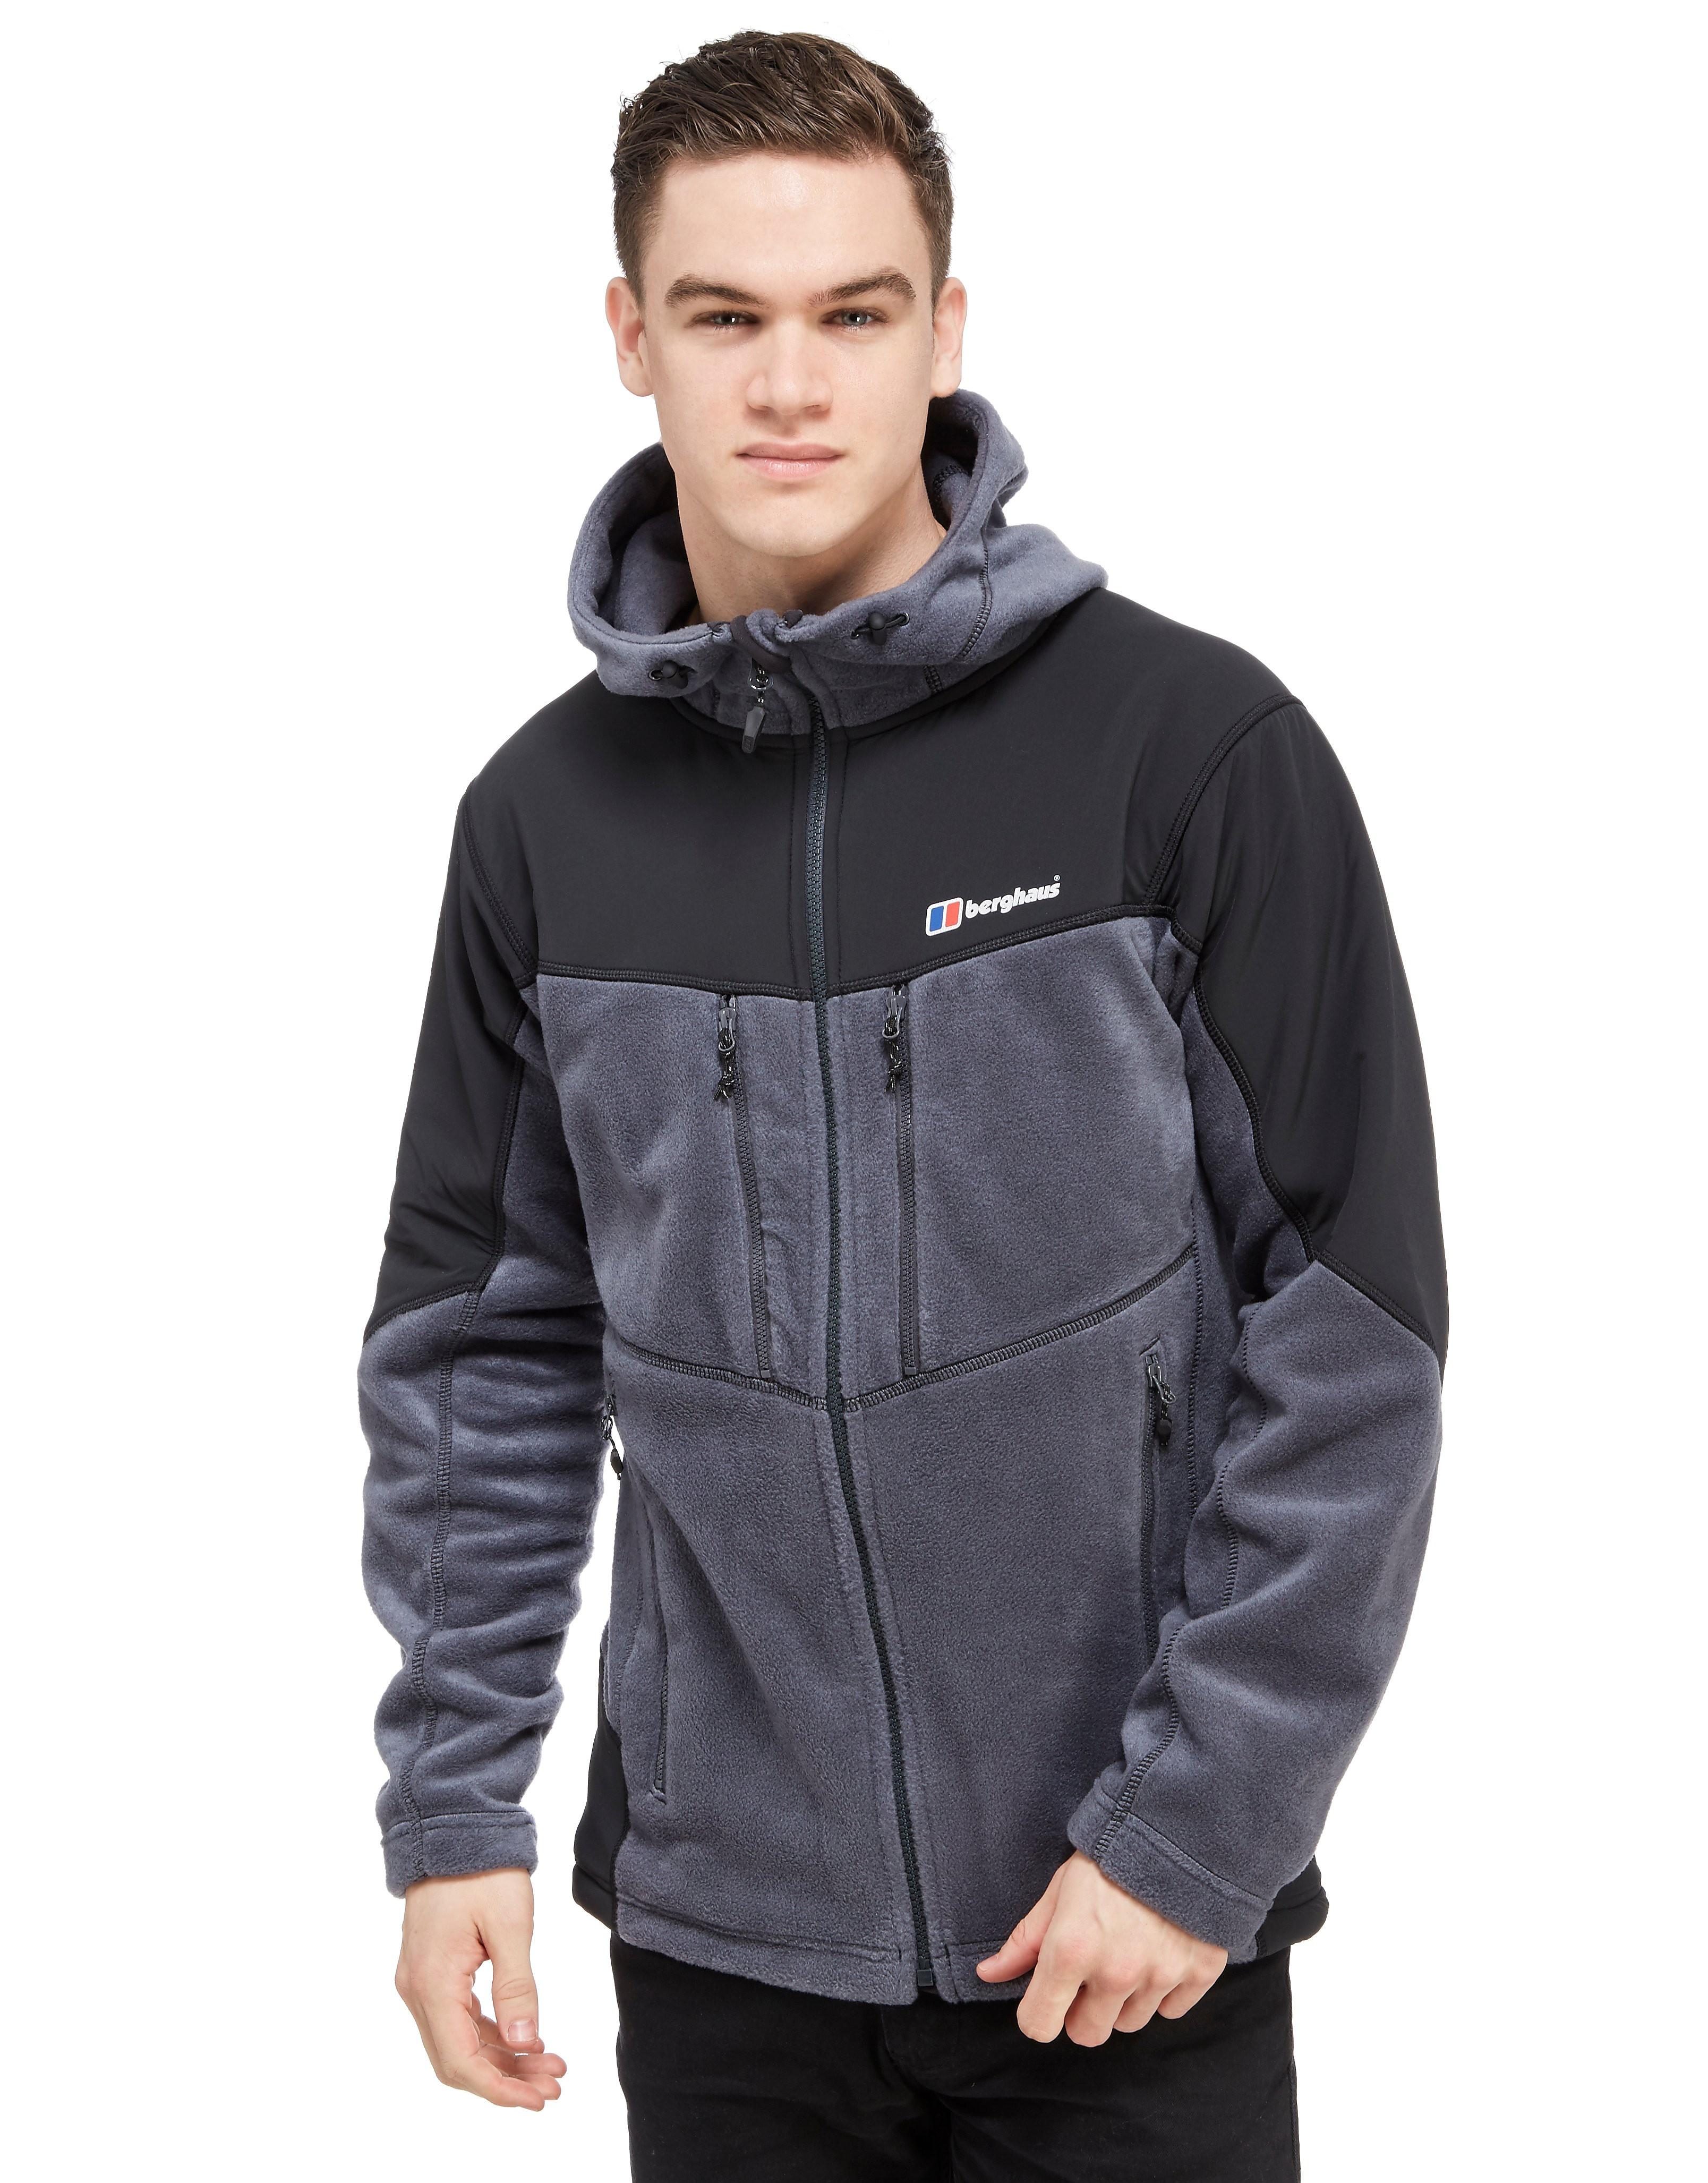 Berghaus Activity Guide Jacket